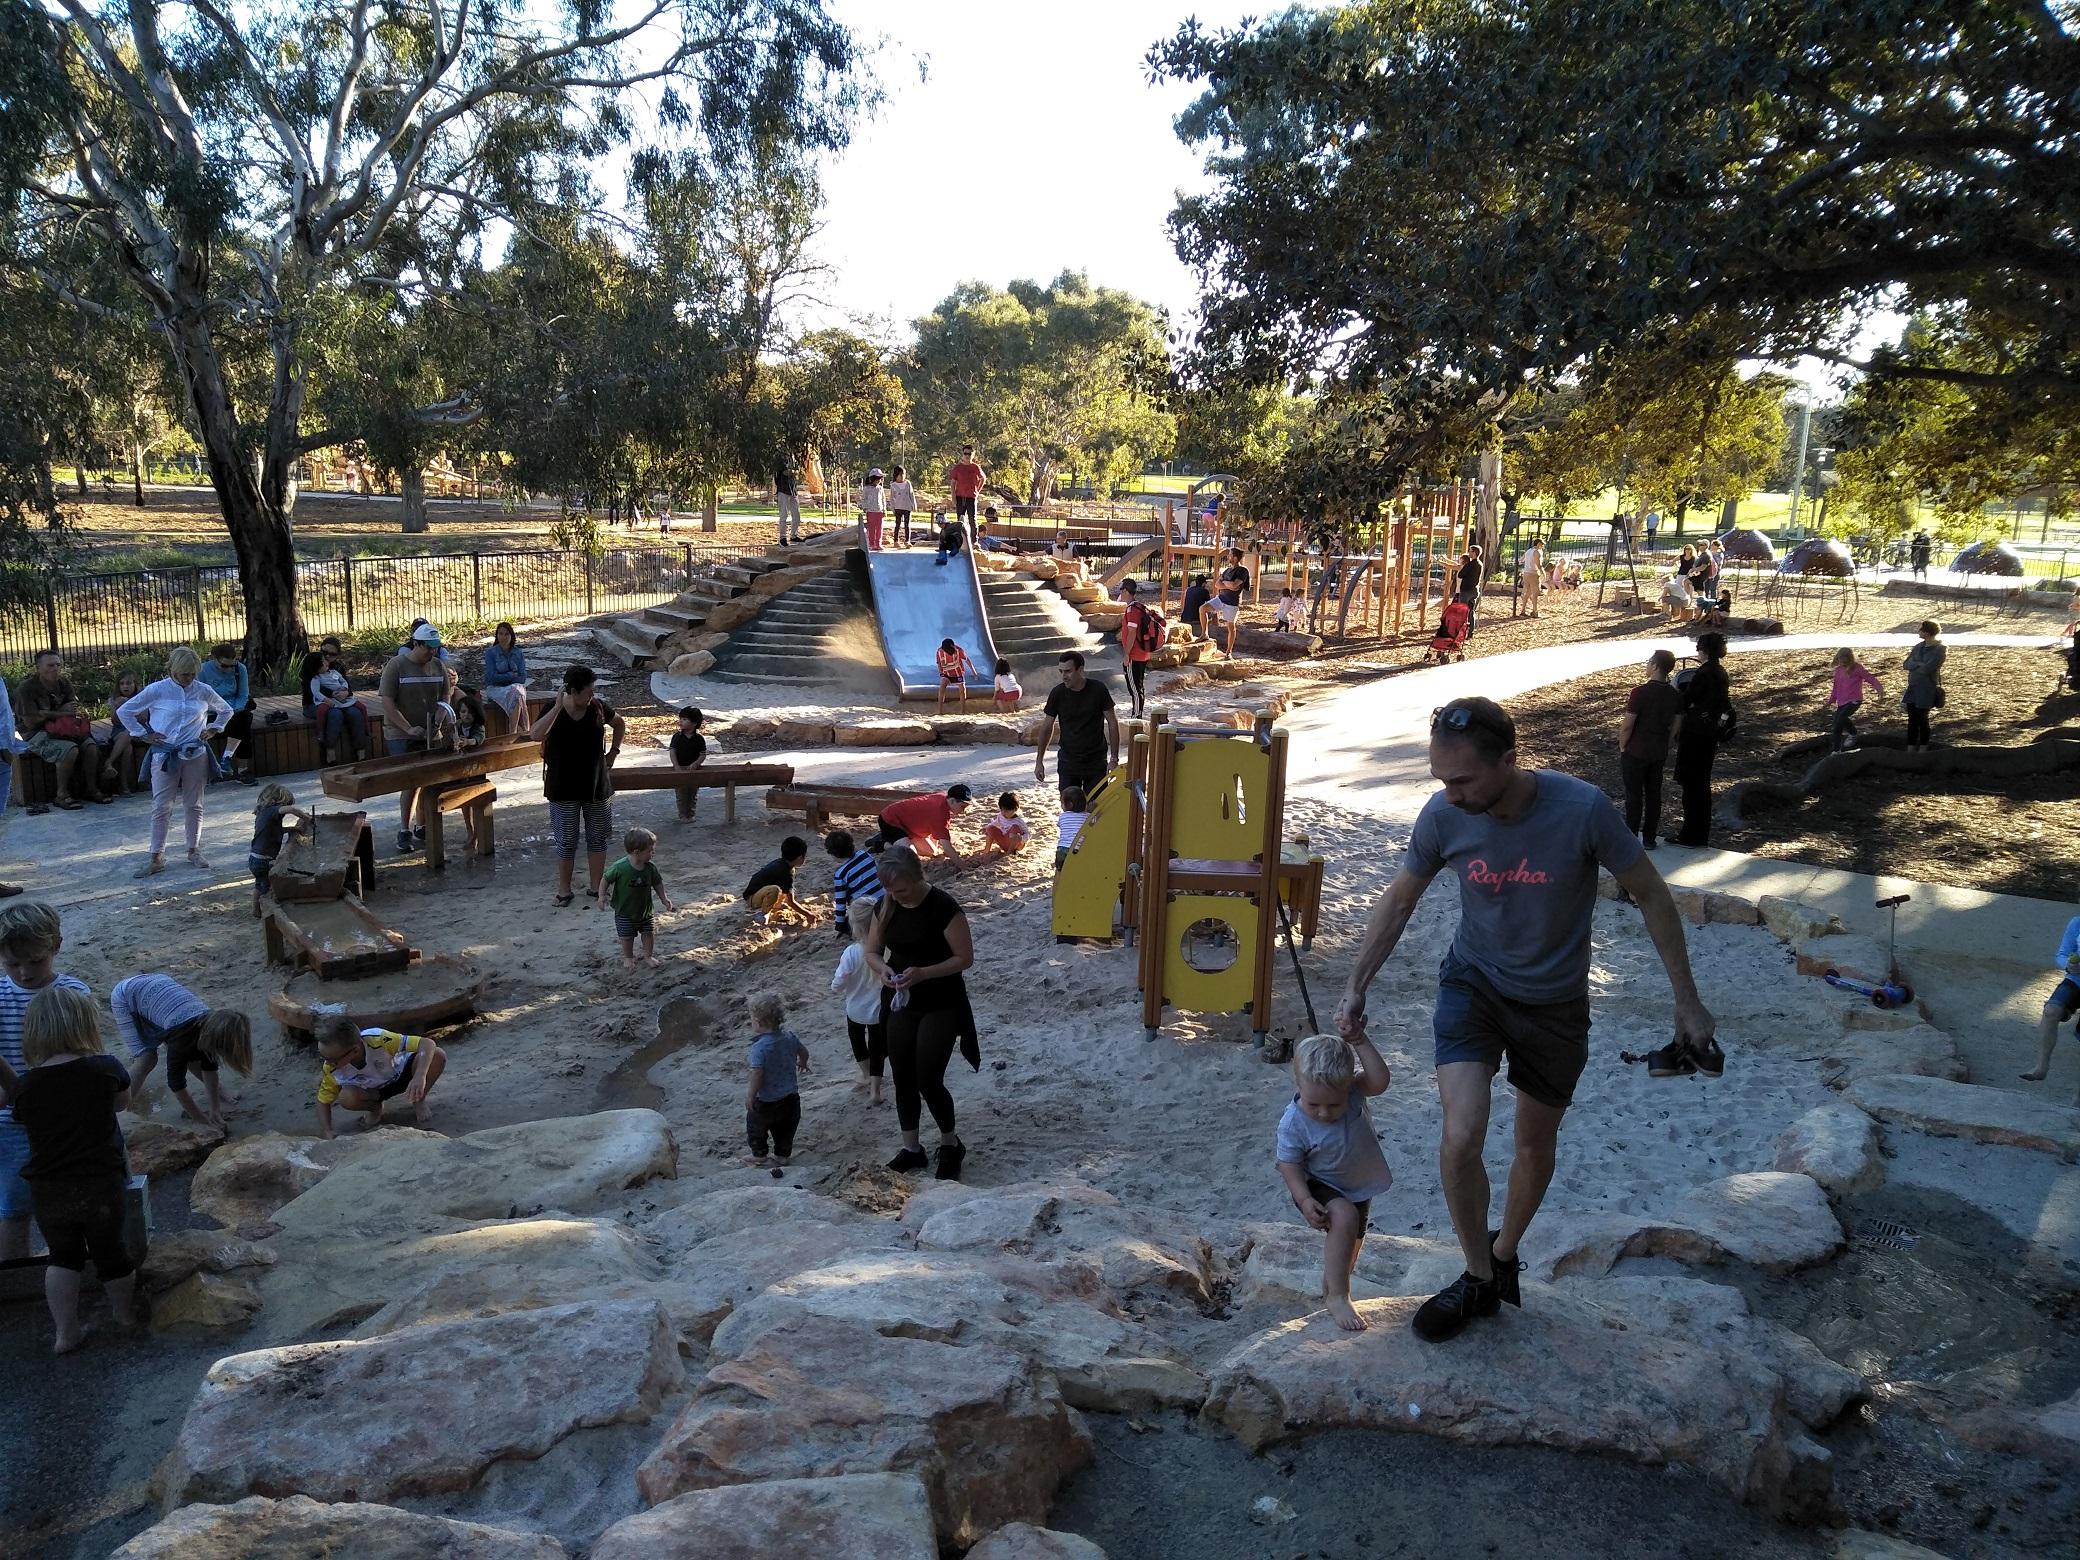 Pityarilla (Park 19) – Adelaide Park Lands